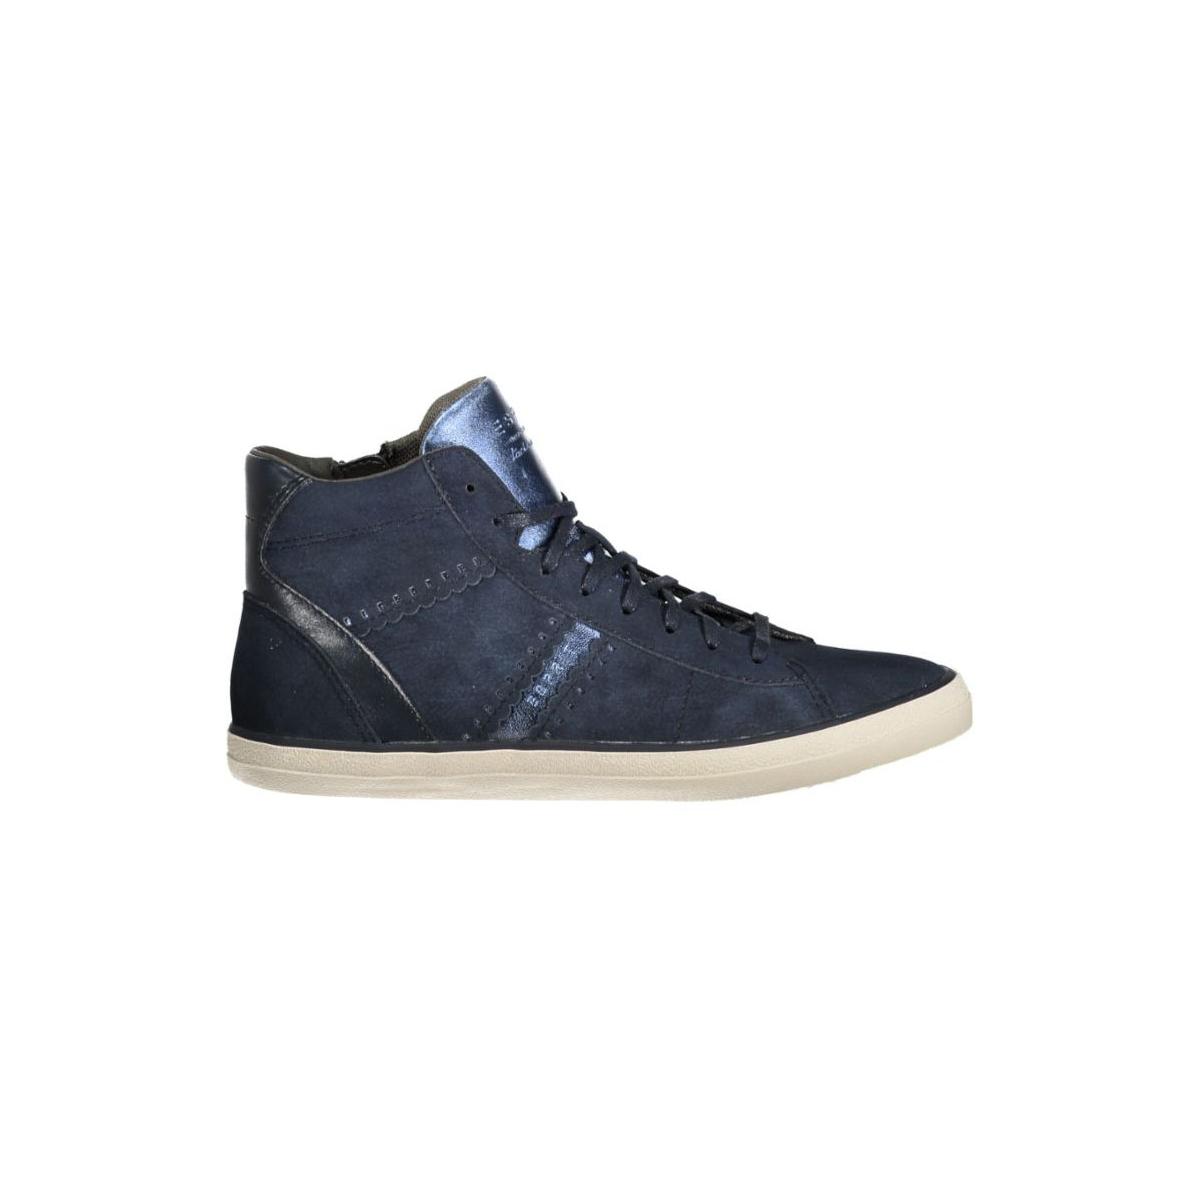 076ek1w022 esprit sneaker e400